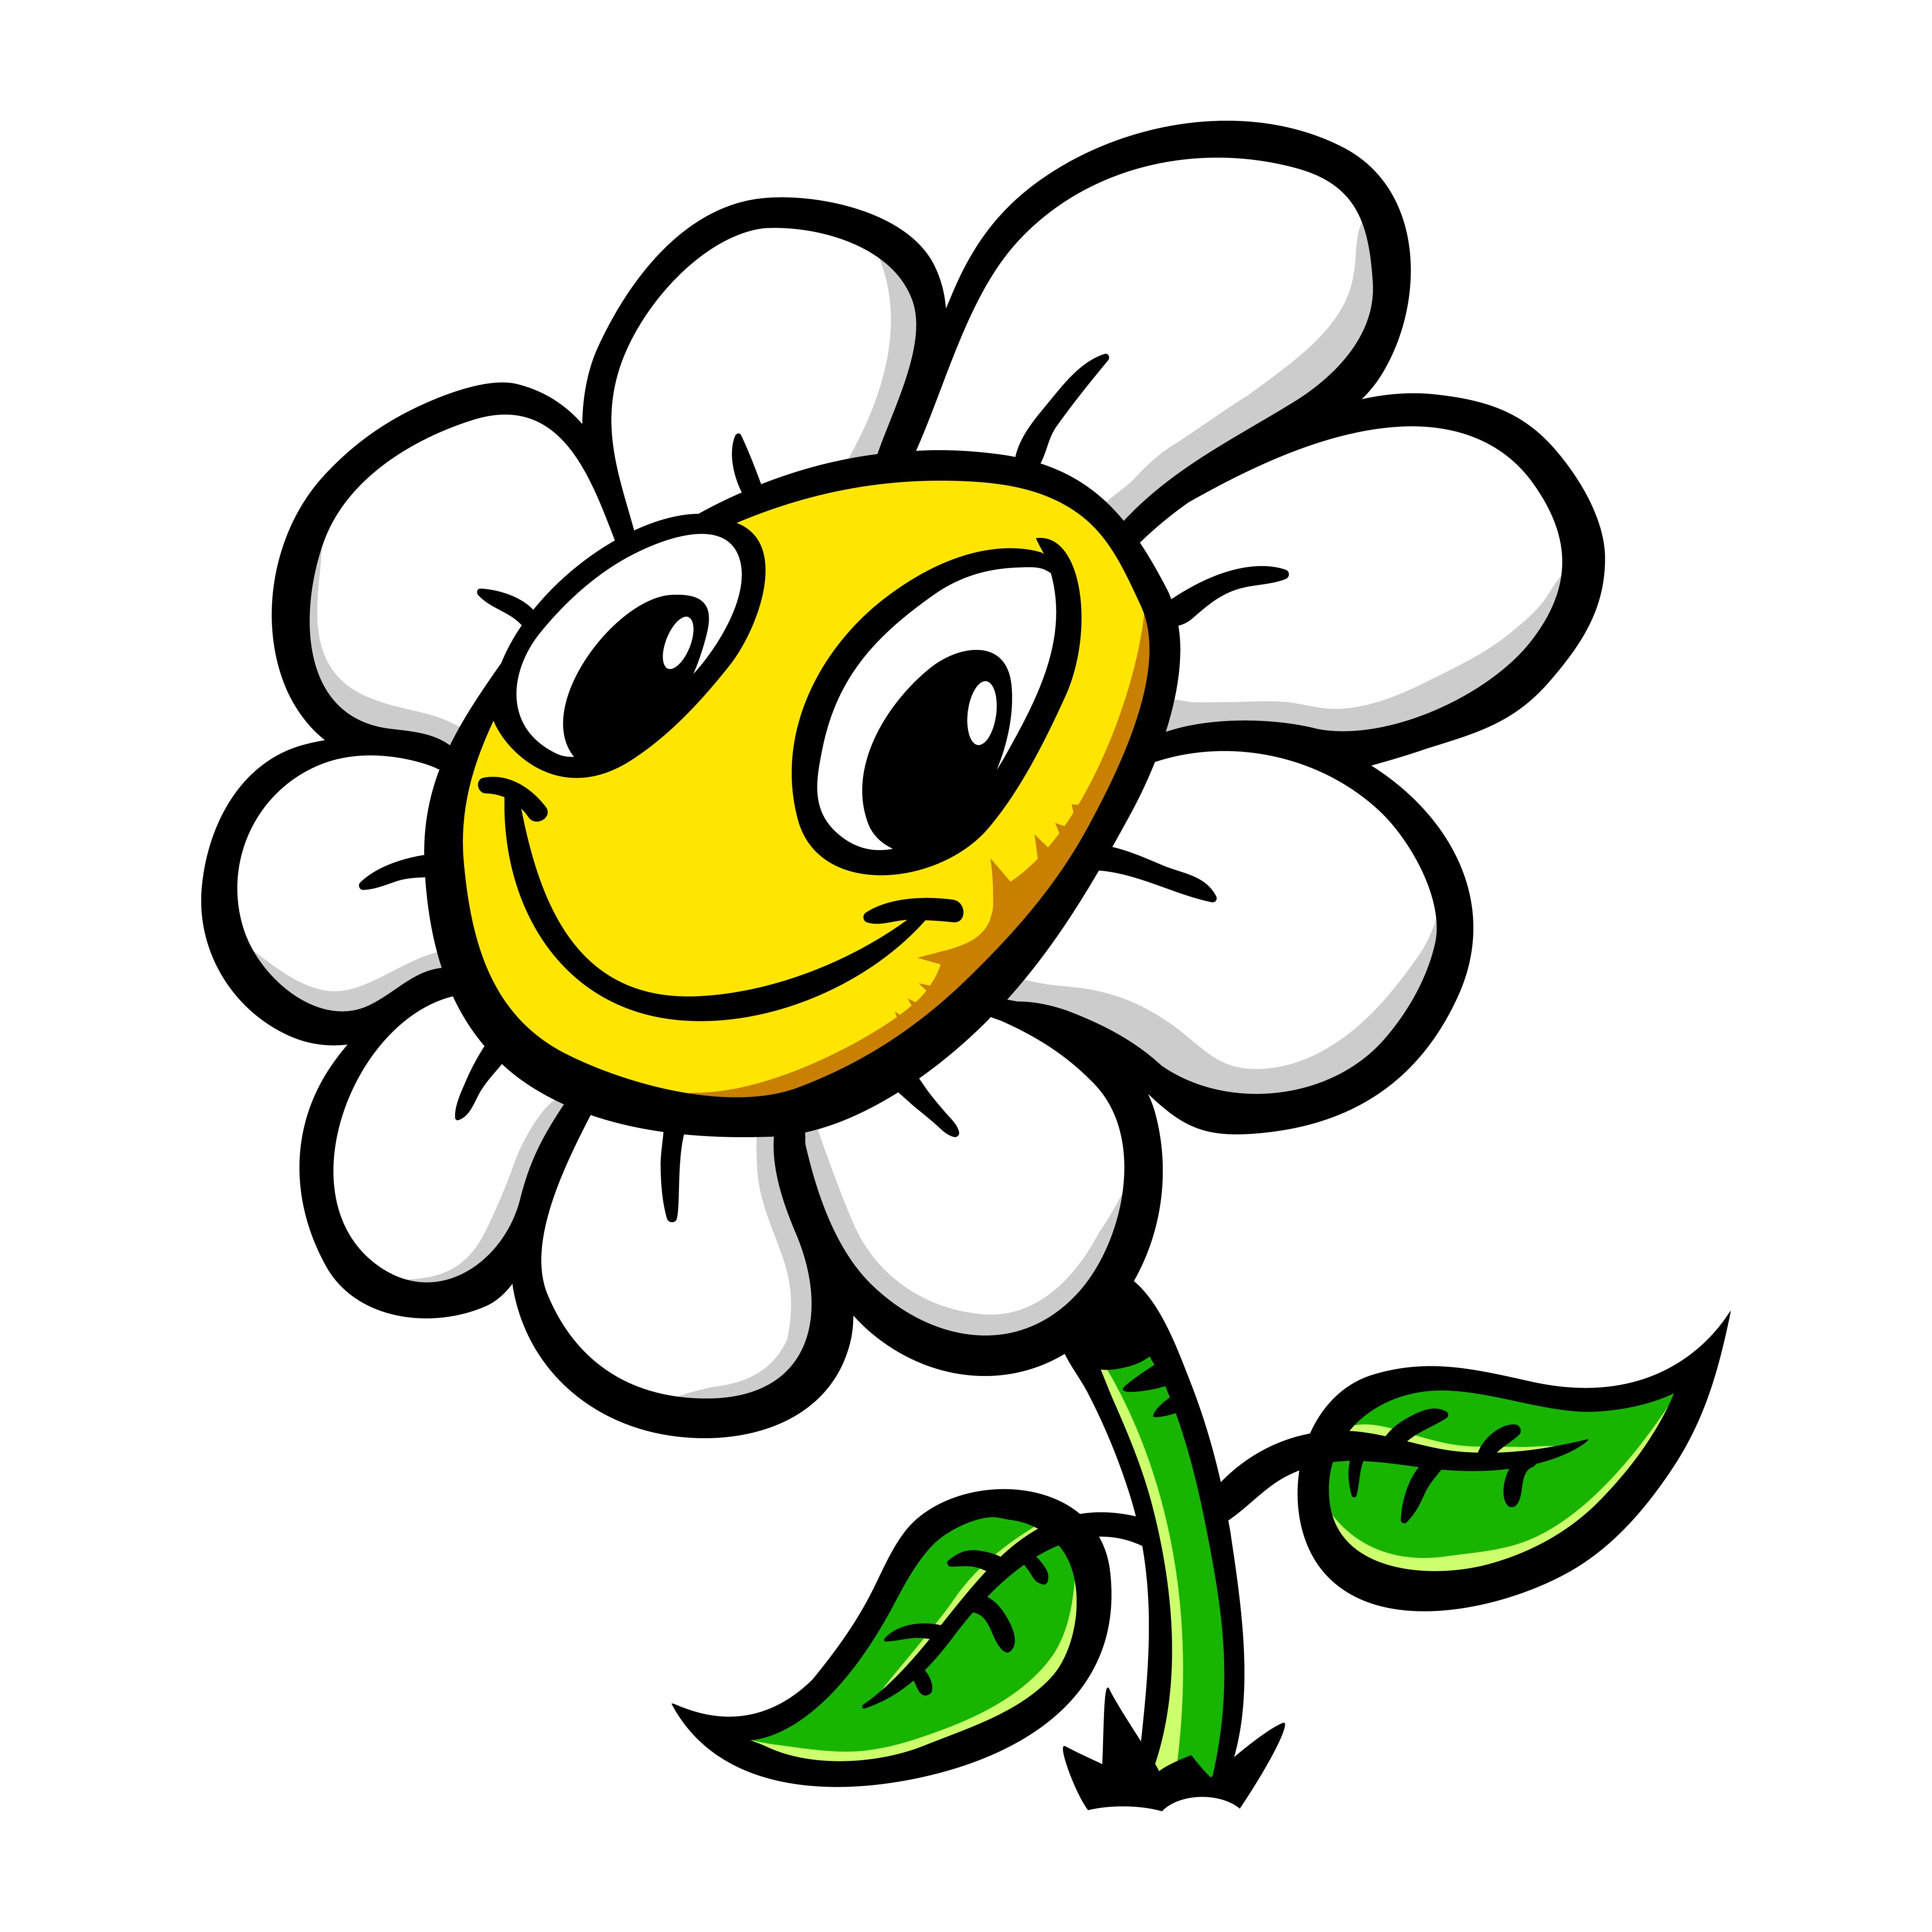 Cartoon Flower - Download Free Vectors, Clipart Graphics ... (5000 x 5000 Pixel)